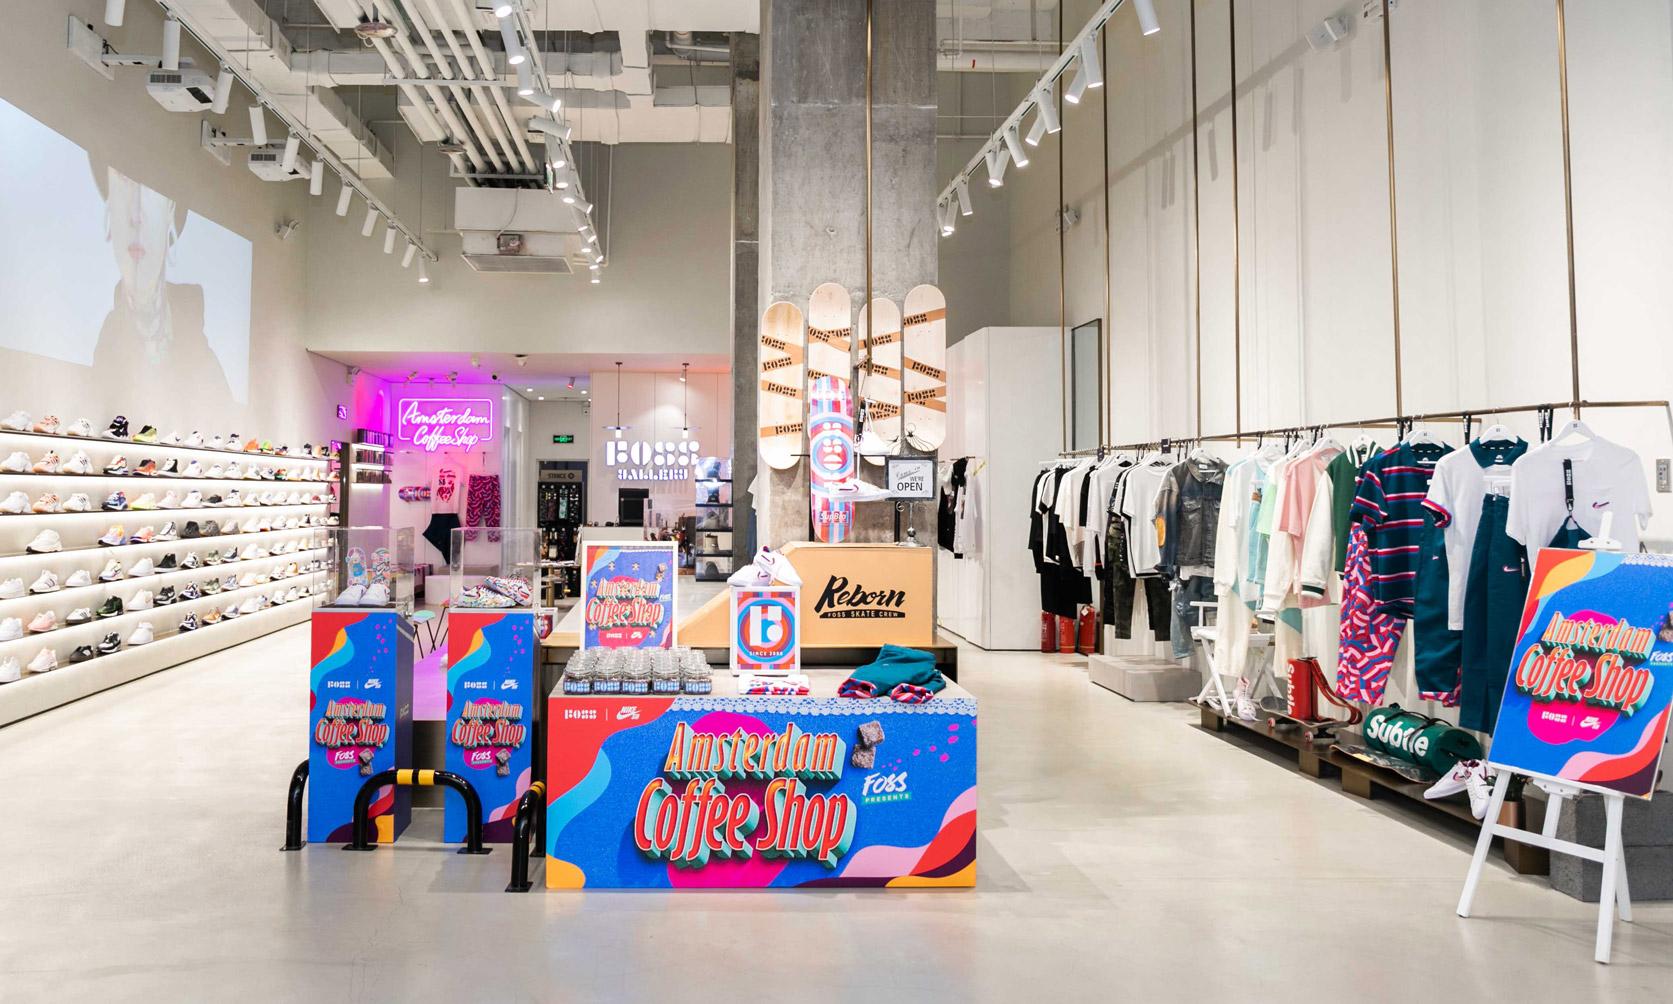 Parra x Nike 滑板盛宴,FOSS 沈阳特别打造 Amsterdam Coffee Shop